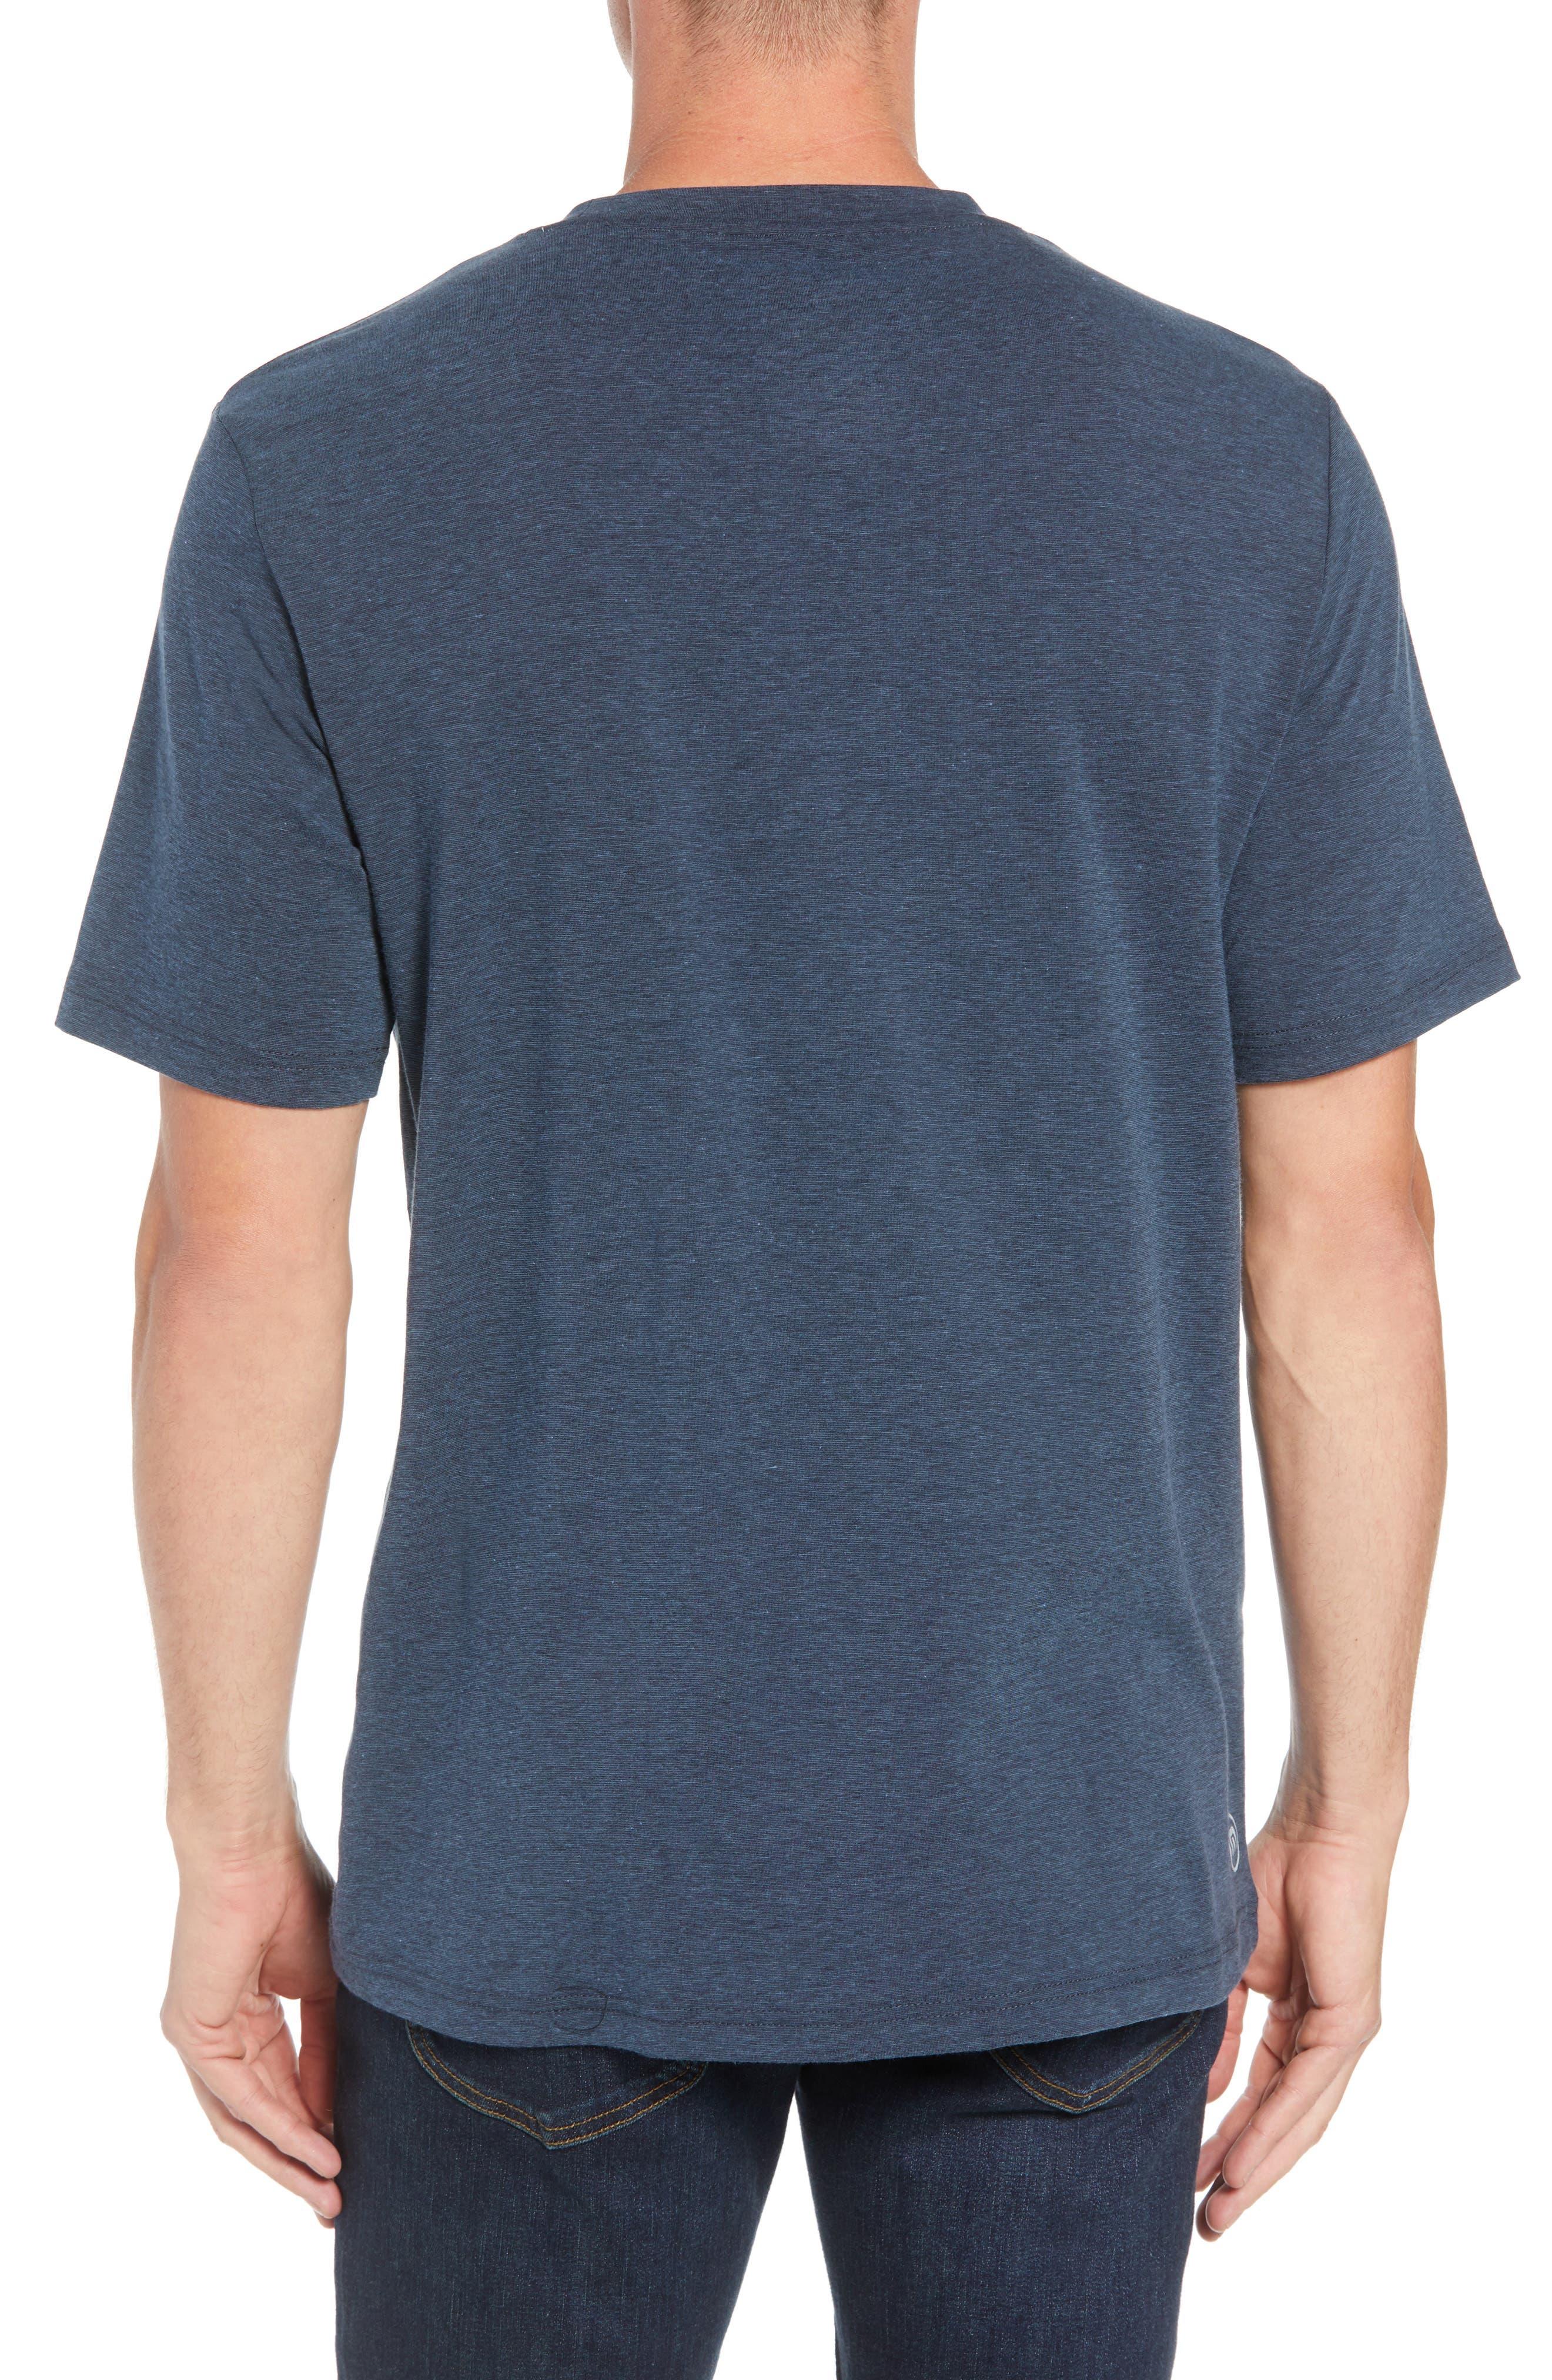 Laze T-Shirt,                             Alternate thumbnail 2, color,                             TRUE NAVY/ BLACK